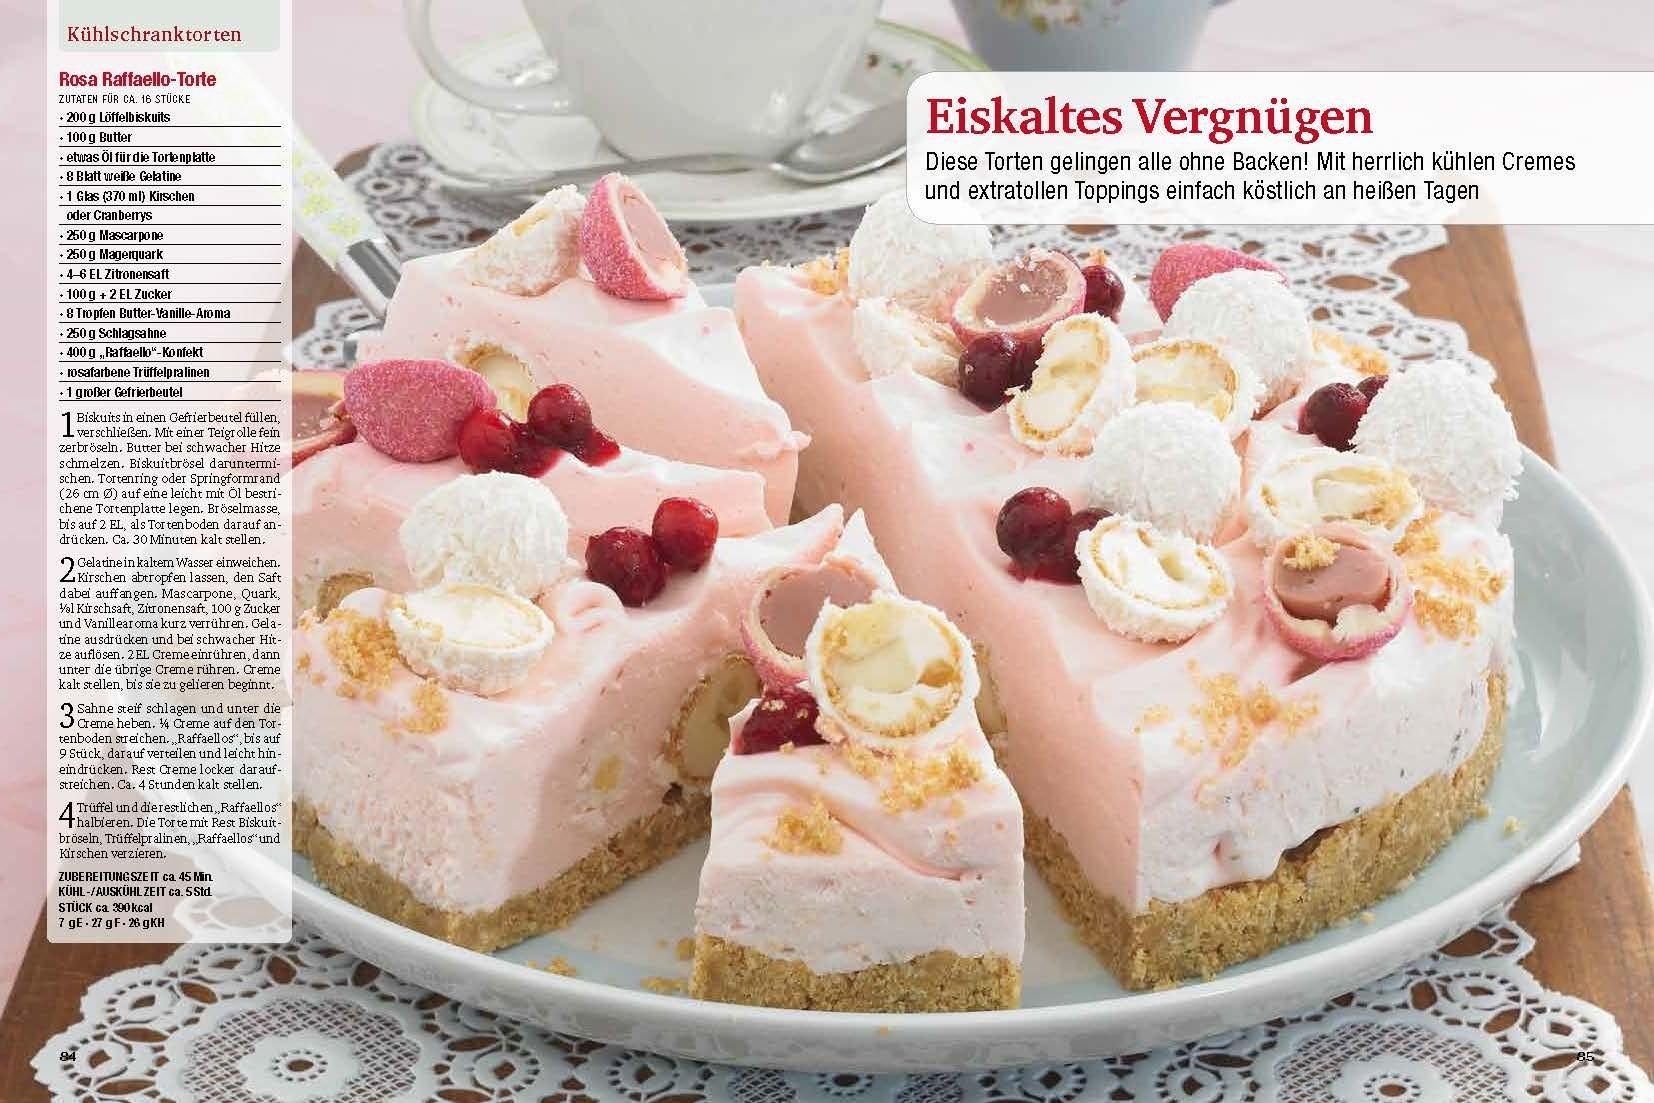 Das Grosse Backbuch Unsere Besten Backrezepte Kochen Geniessen